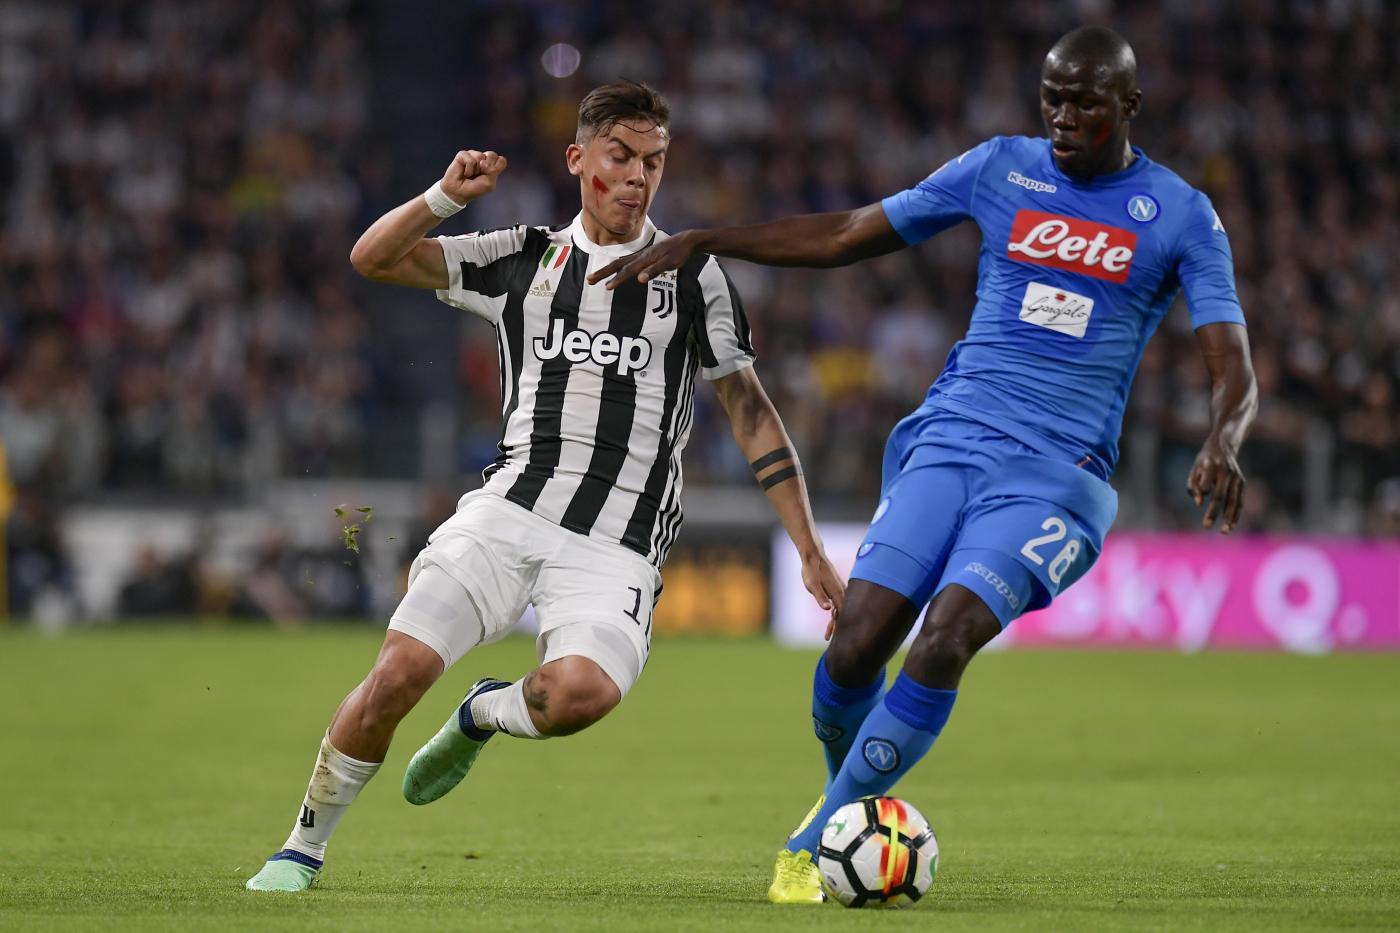 Calendario Napoli E Juve A Confronto.Juve Napoli Scudetto All Ultimo Respiro Ecco Il Calendario